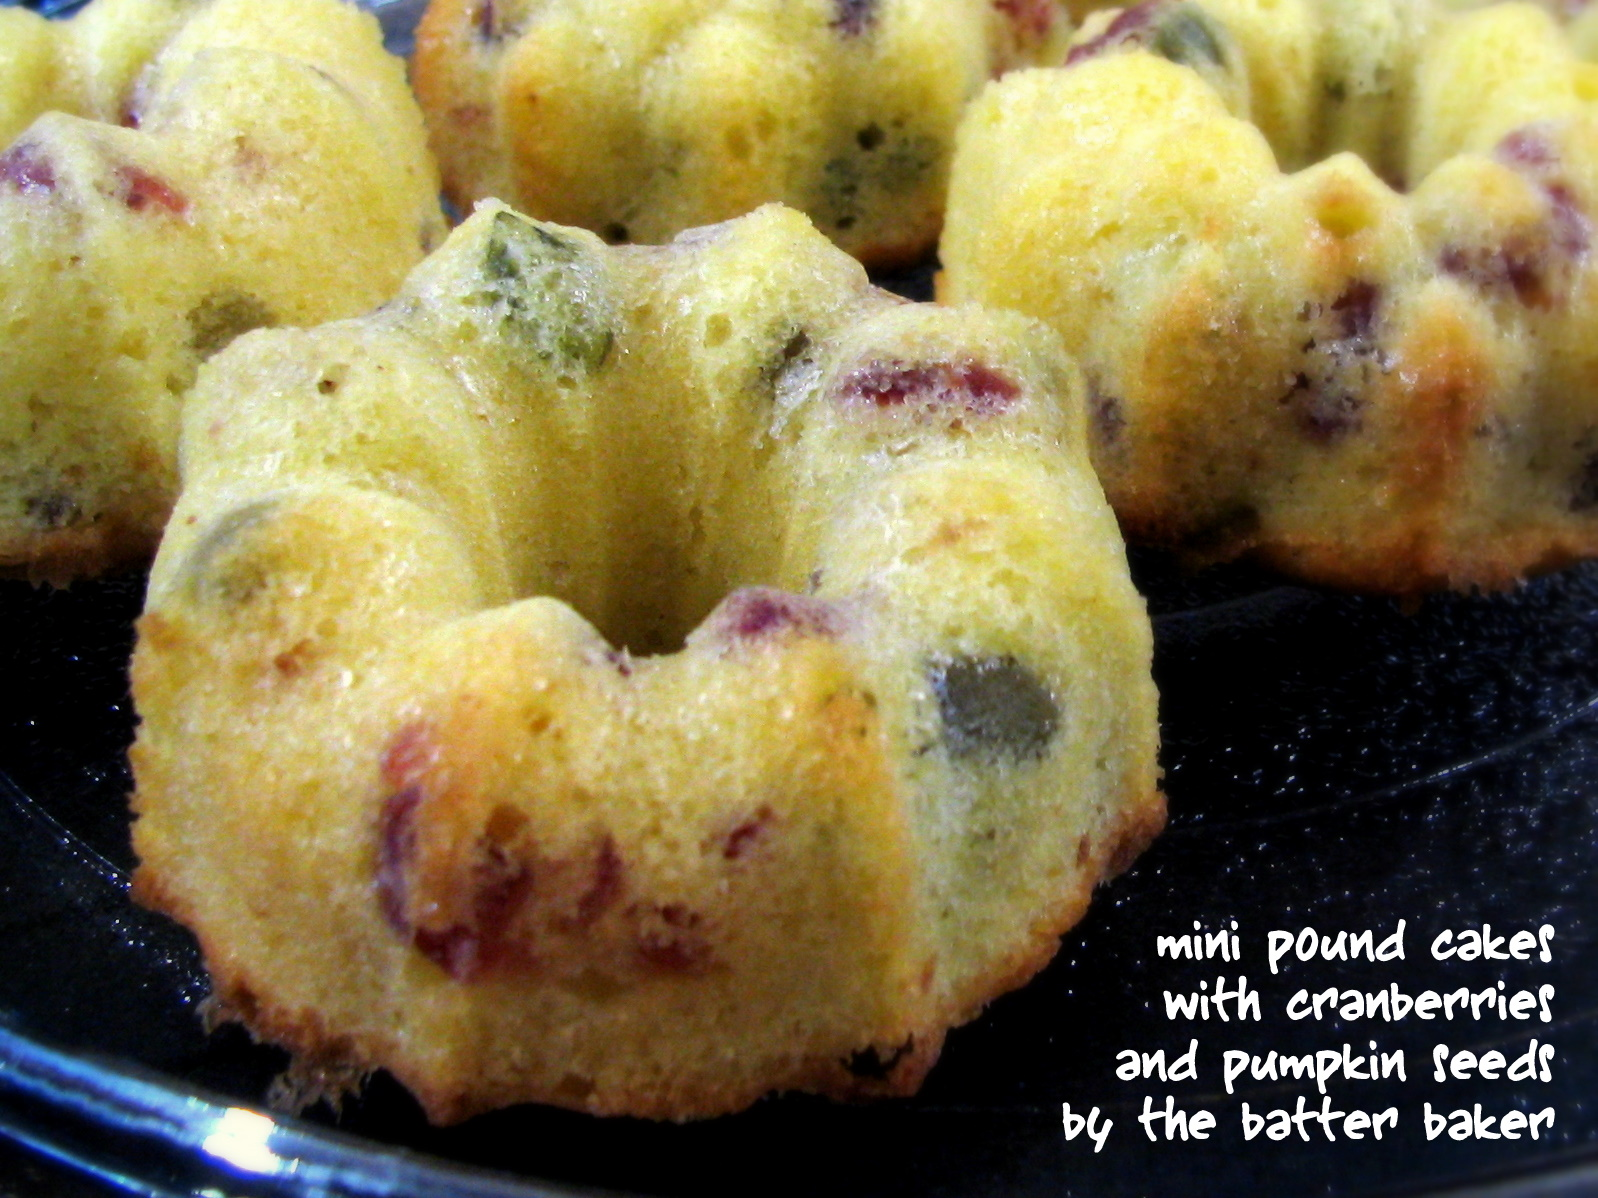 Pound Cake Recipe Without Crisco